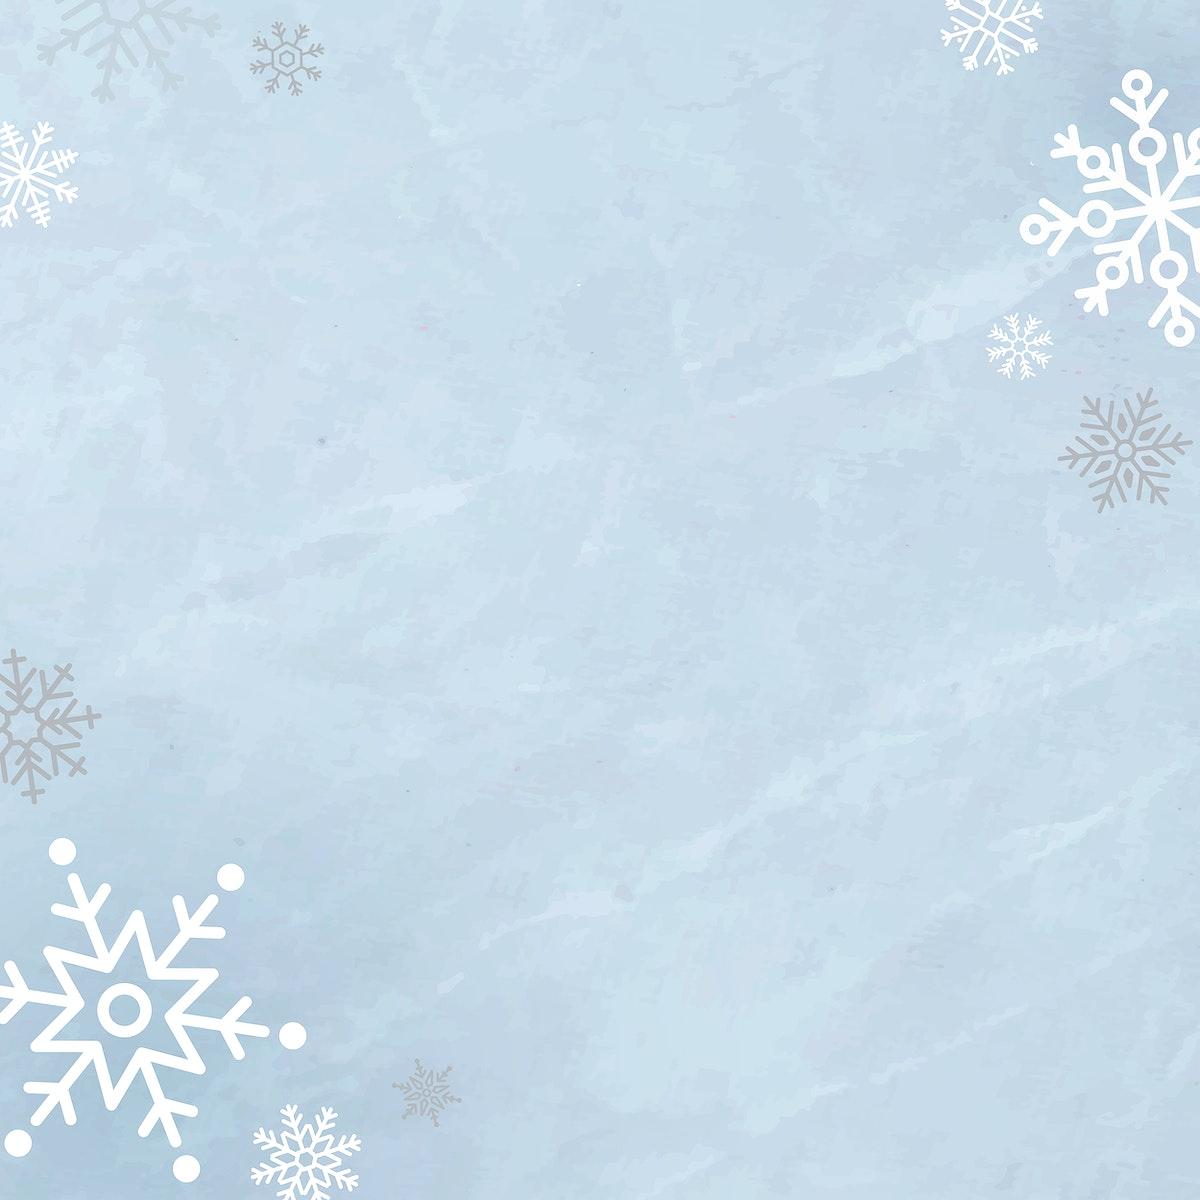 Snowflake Christmas frame social ads template vector